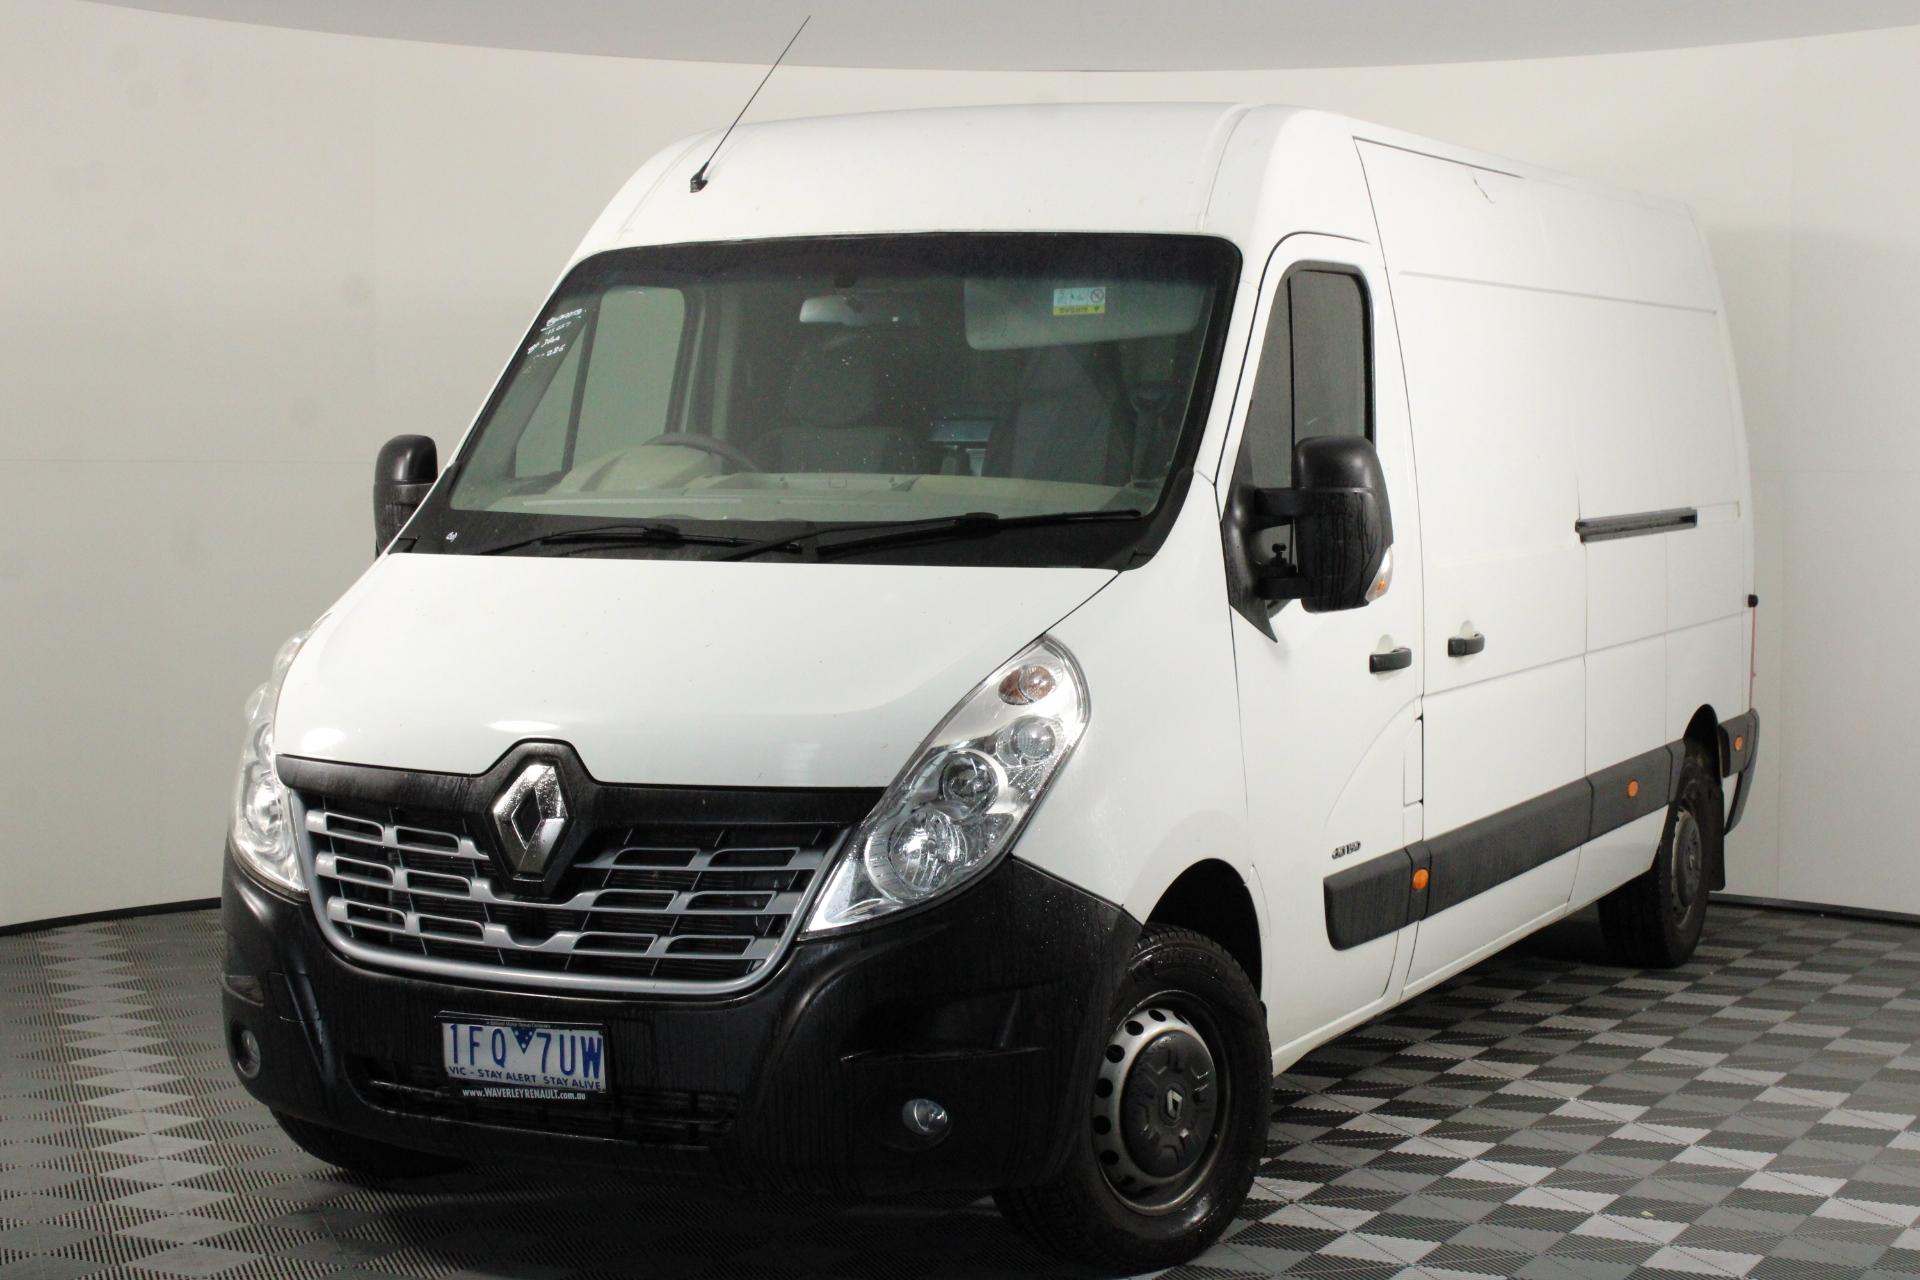 2015 Renault Master LWB Mid Roof Turbo Diesel Automatic Van